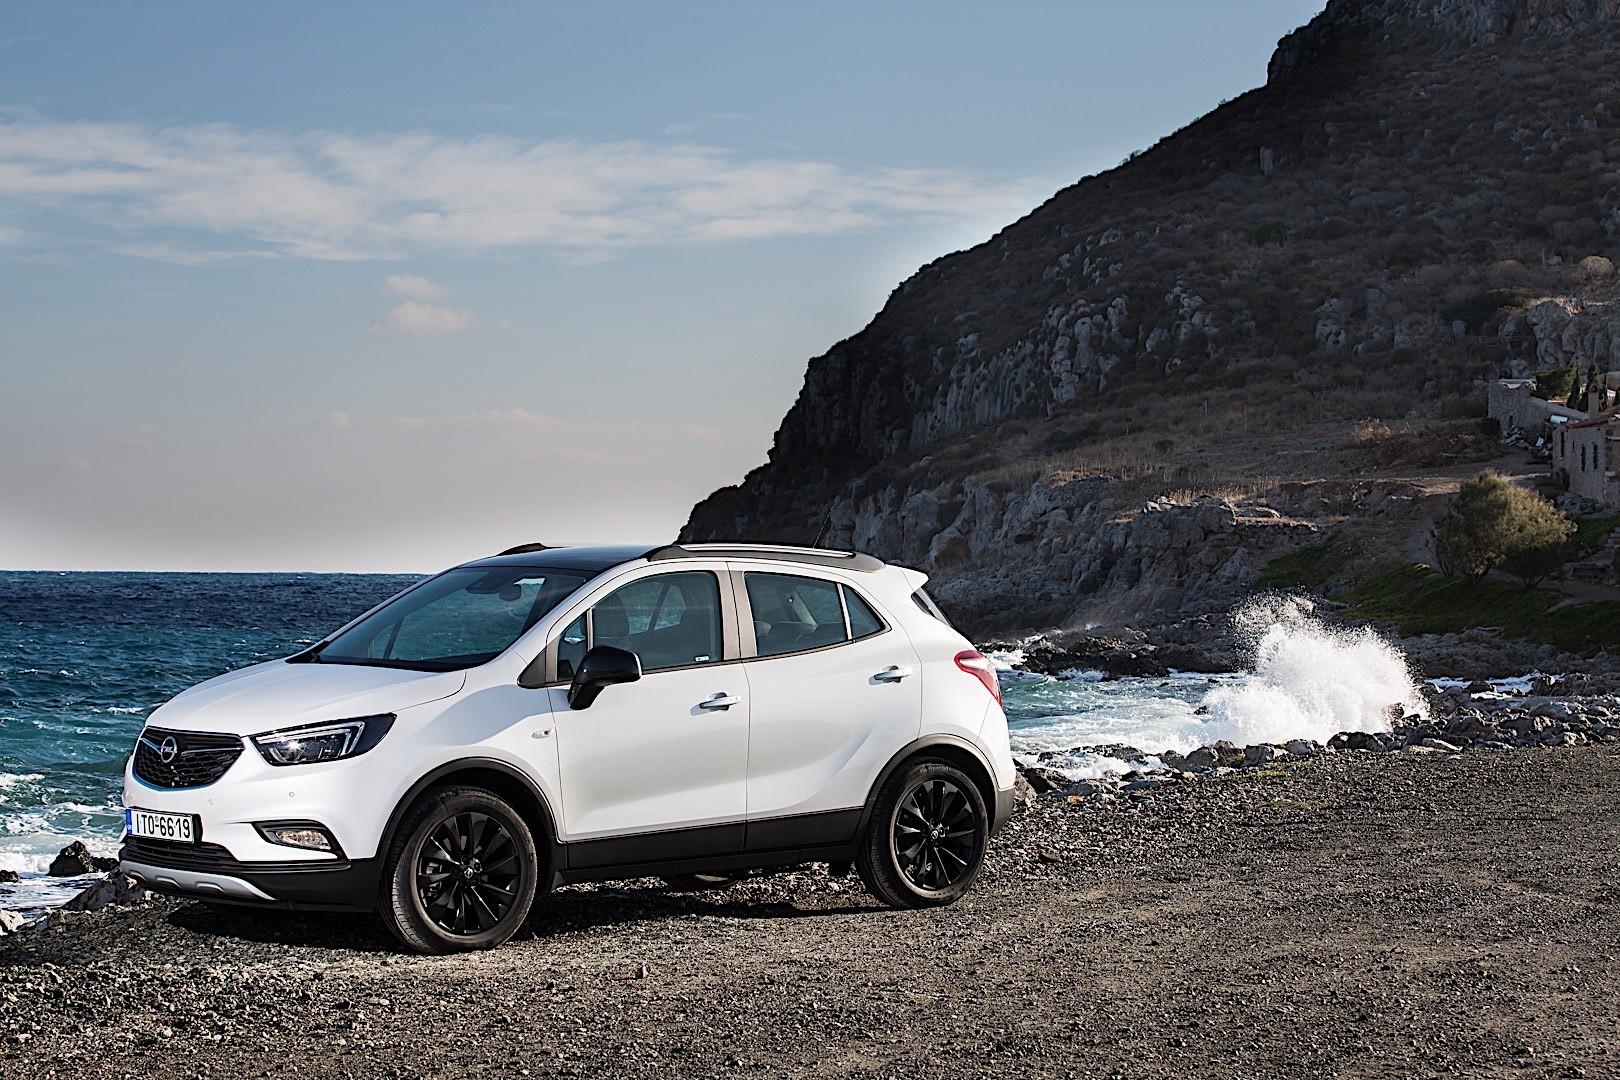 Vauxhall Mokka U R Lr moreover Opel Mokka X together with Yeni Opel Mokka X furthermore Opel Corsa Opc Line moreover Opel Mokka X Interior. on 2017 opel mokka interior x